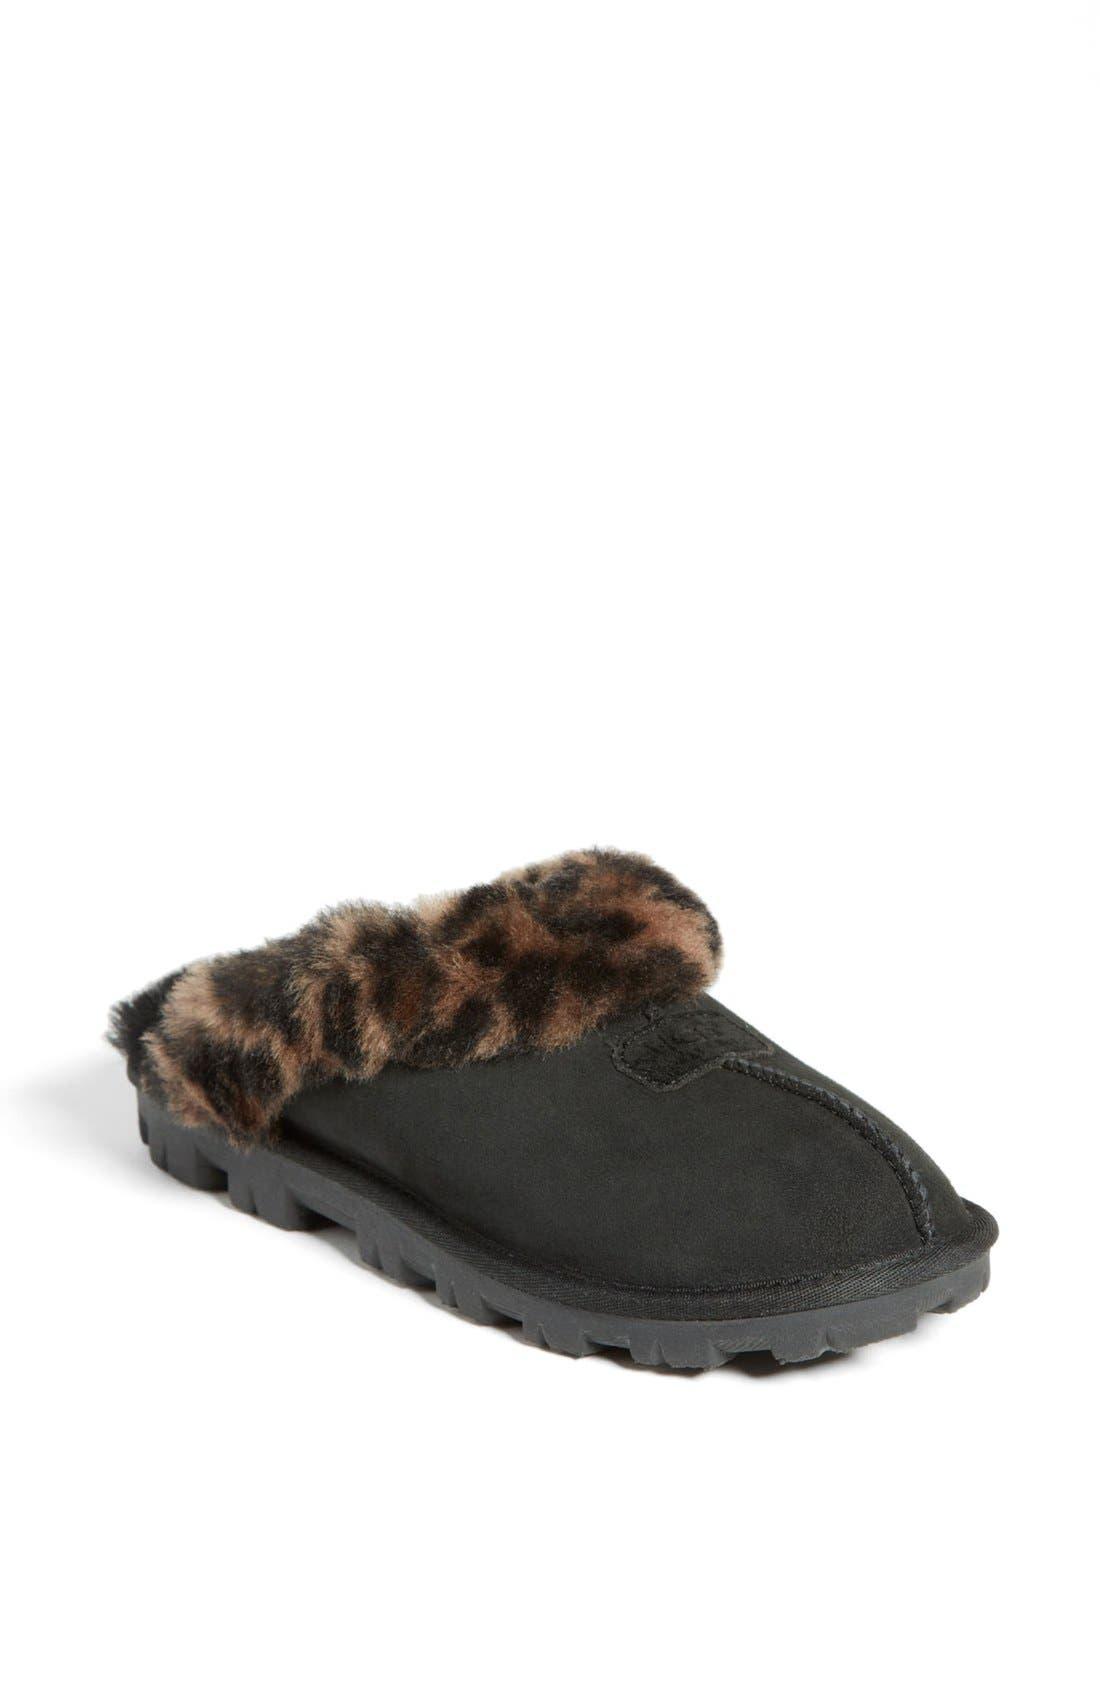 Main Image - UGG® Leopard Spot Slipper (Women)